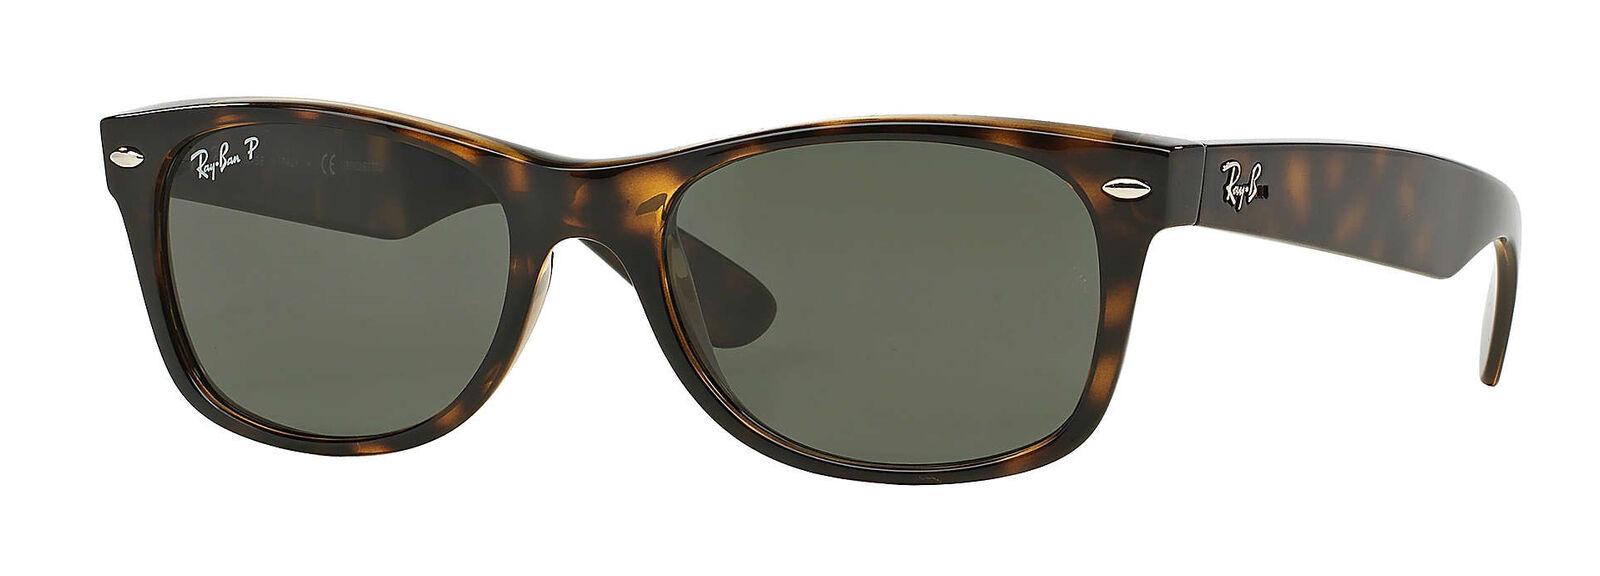 a18aa2ea42d Ray-Ban New Wayfarer Classic Sunglasses RB2132 902 58 55-18 Green ...